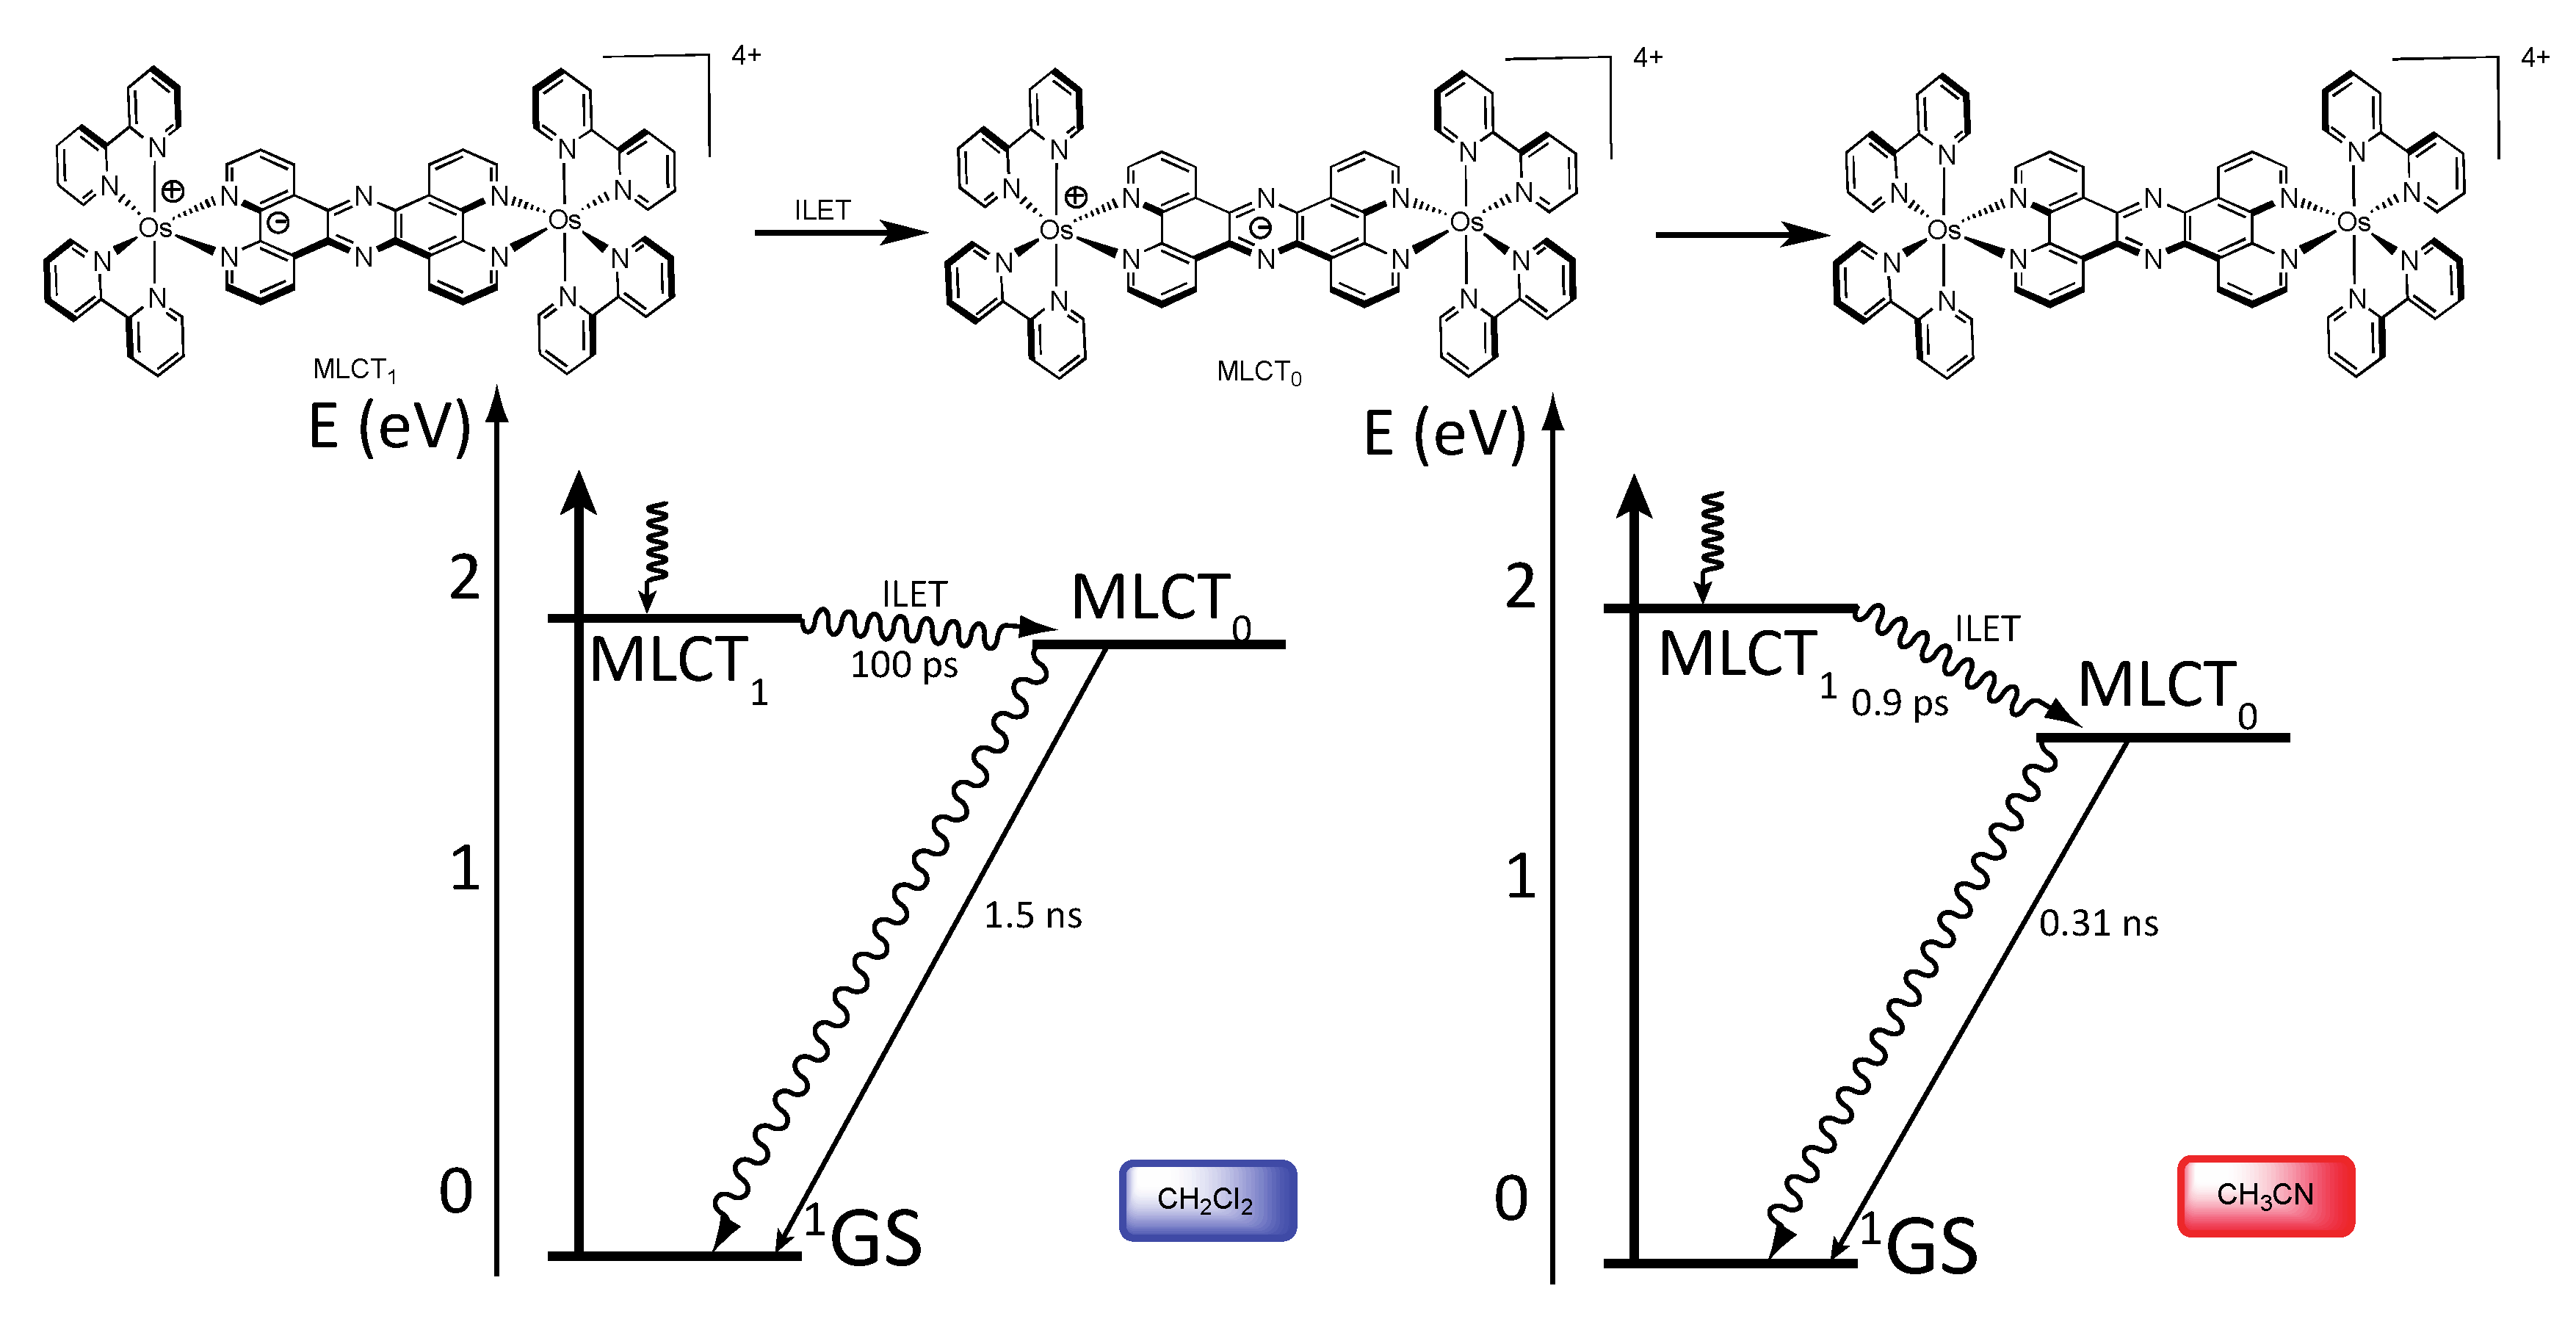 western plow wiring diagram 2001 dodge